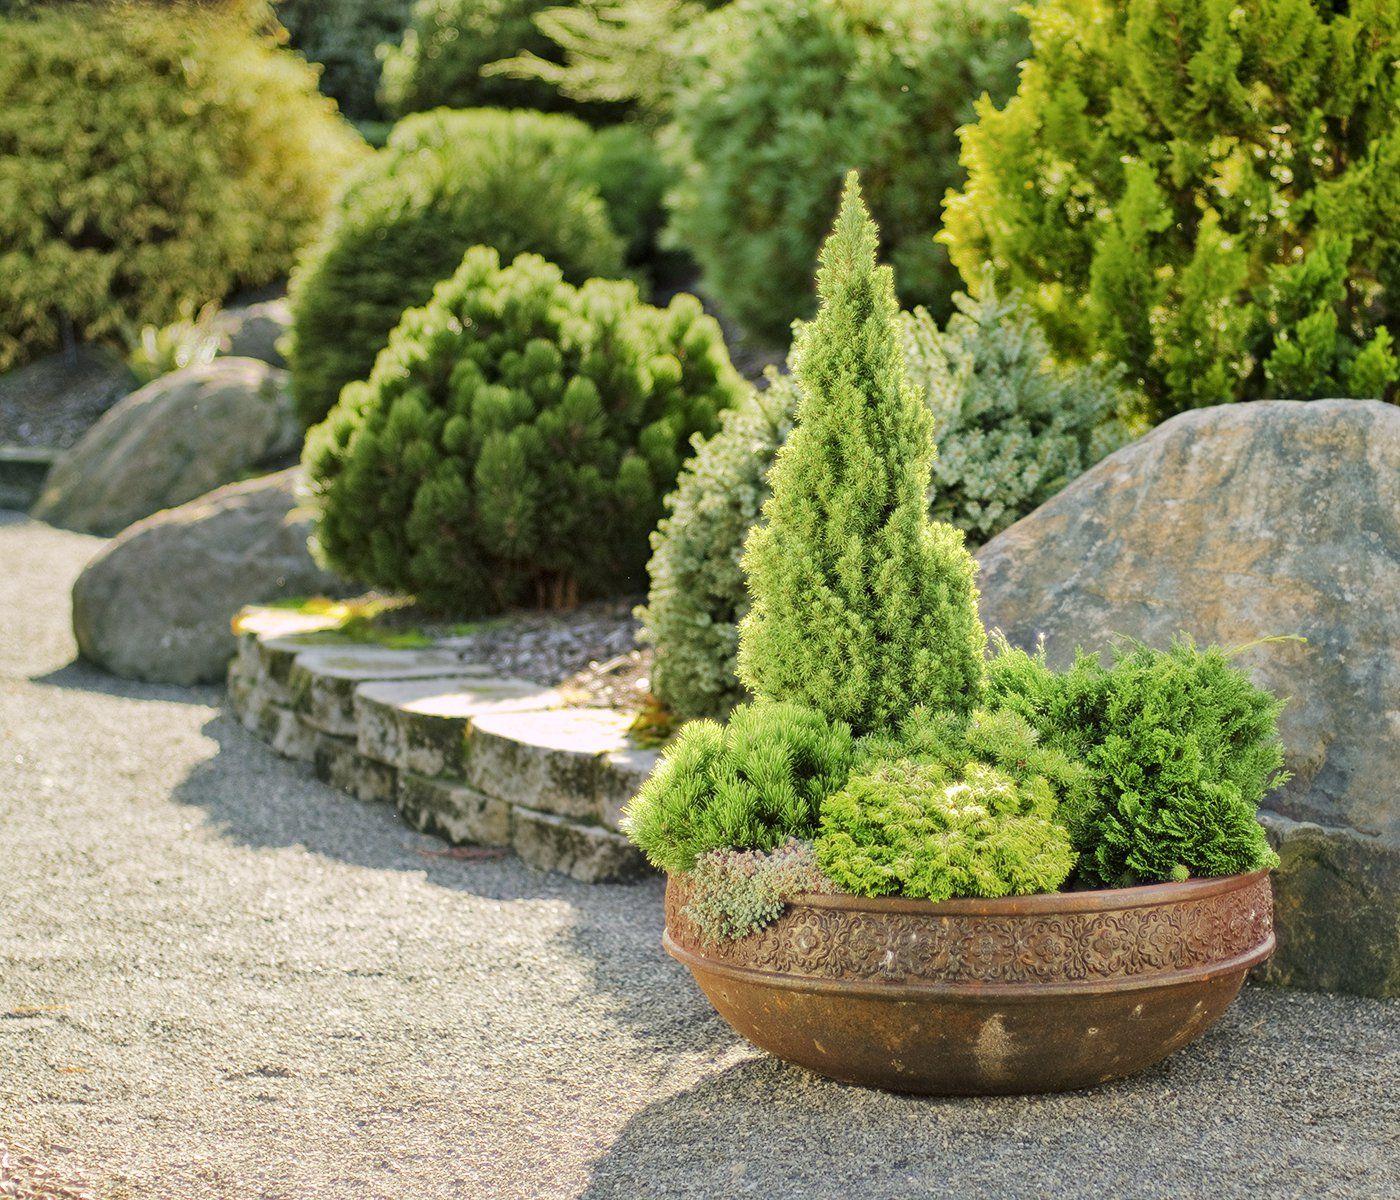 Small Evergreen Shrubs For Pots: Small Evergreens, Big Impact